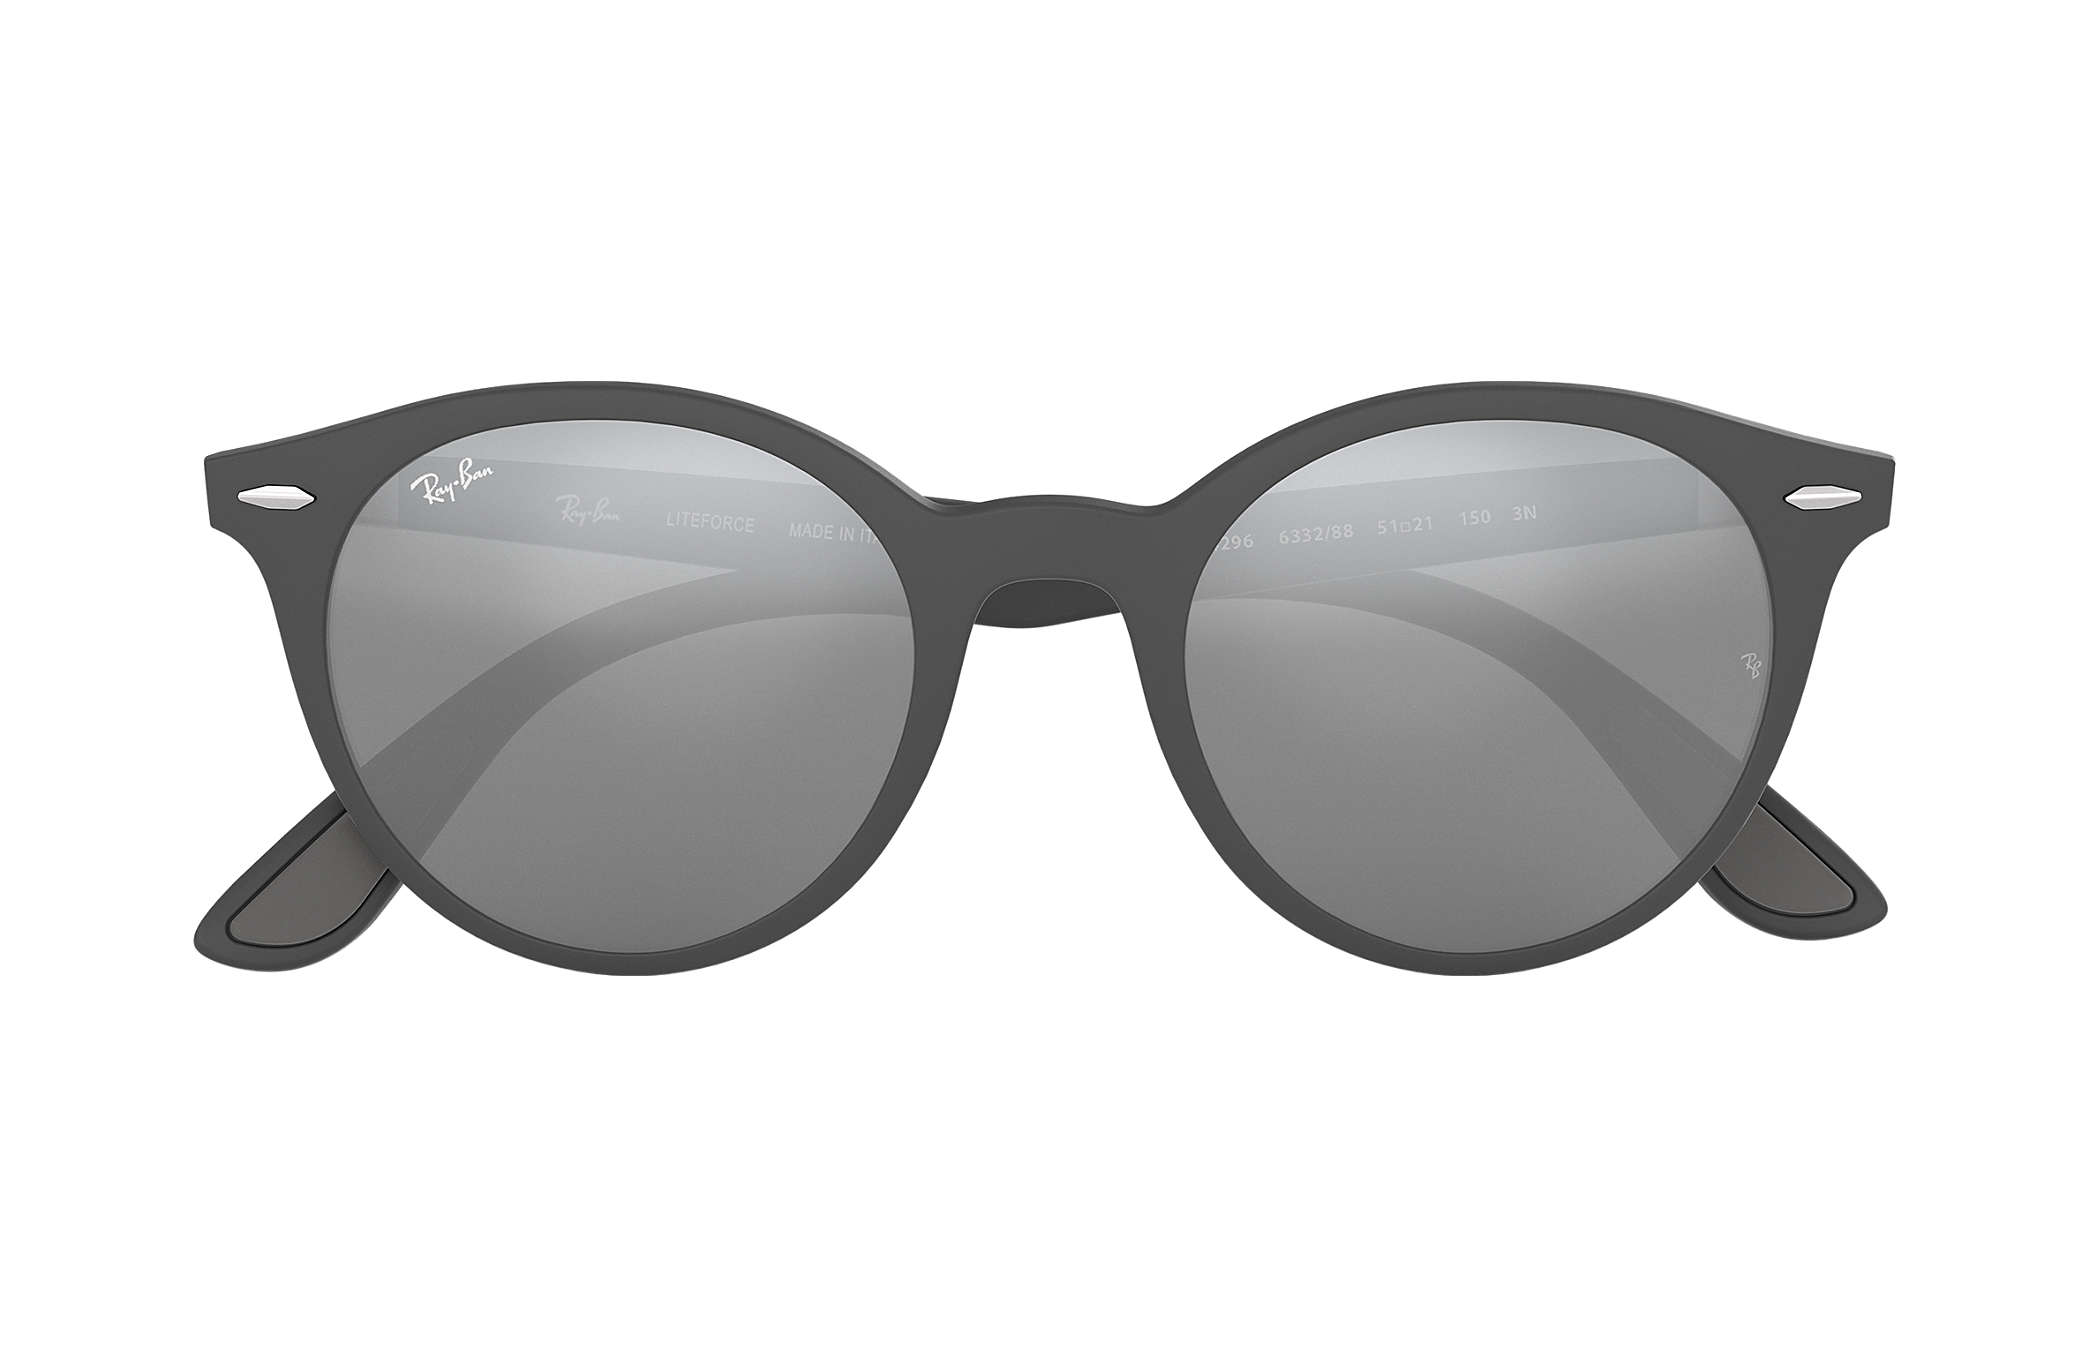 1dfe7efc4e Ray-Ban RB4296 Grey - Peek - Grey Lenses - 0RB429663328851